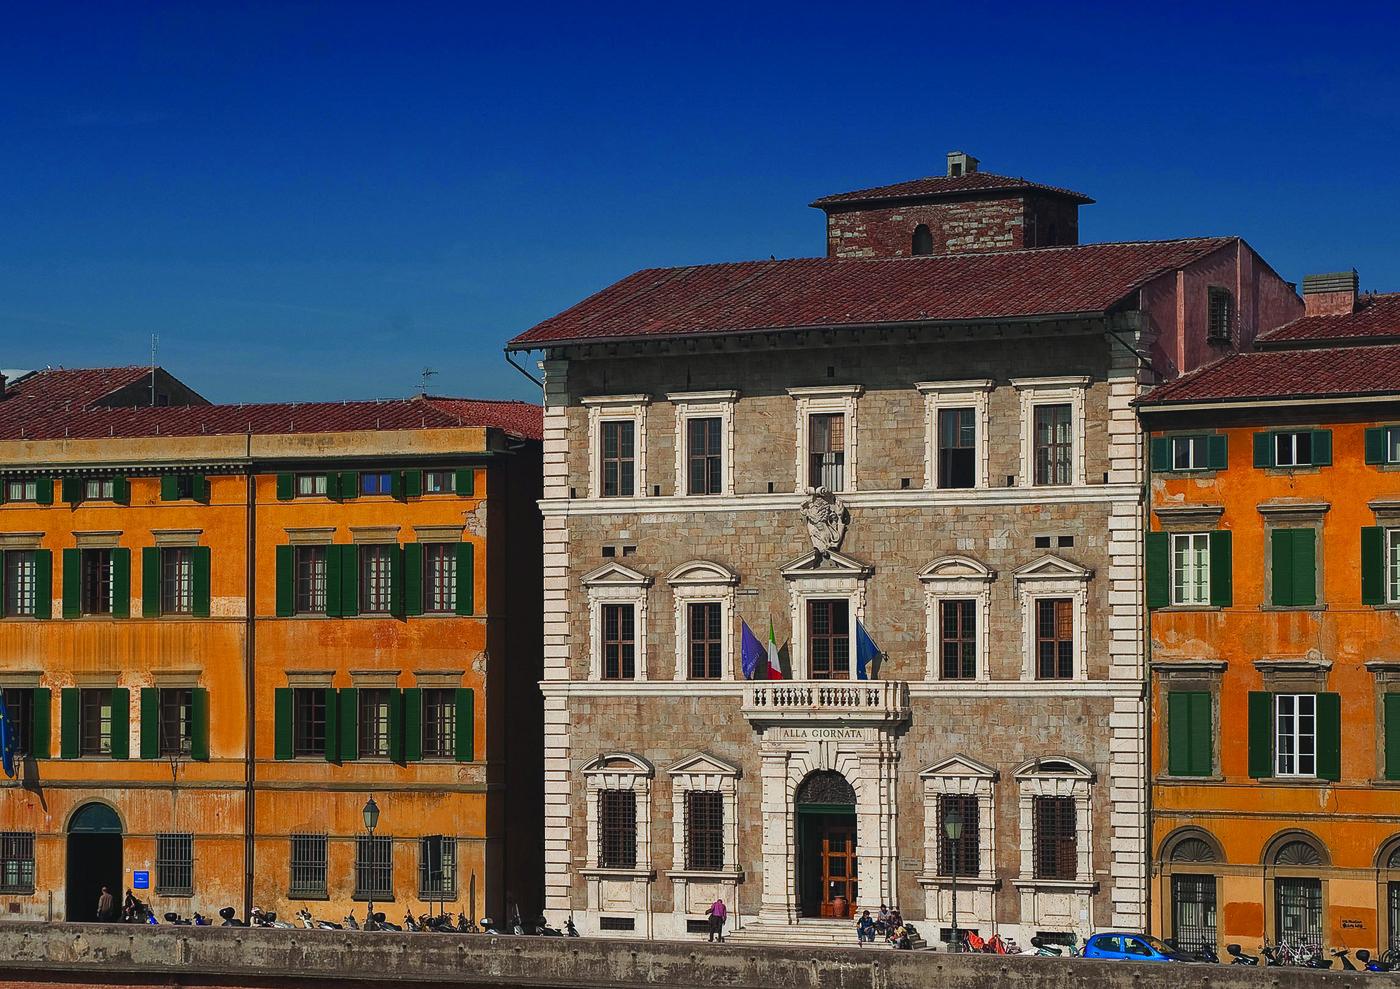 University of Pisa - Rectorate building